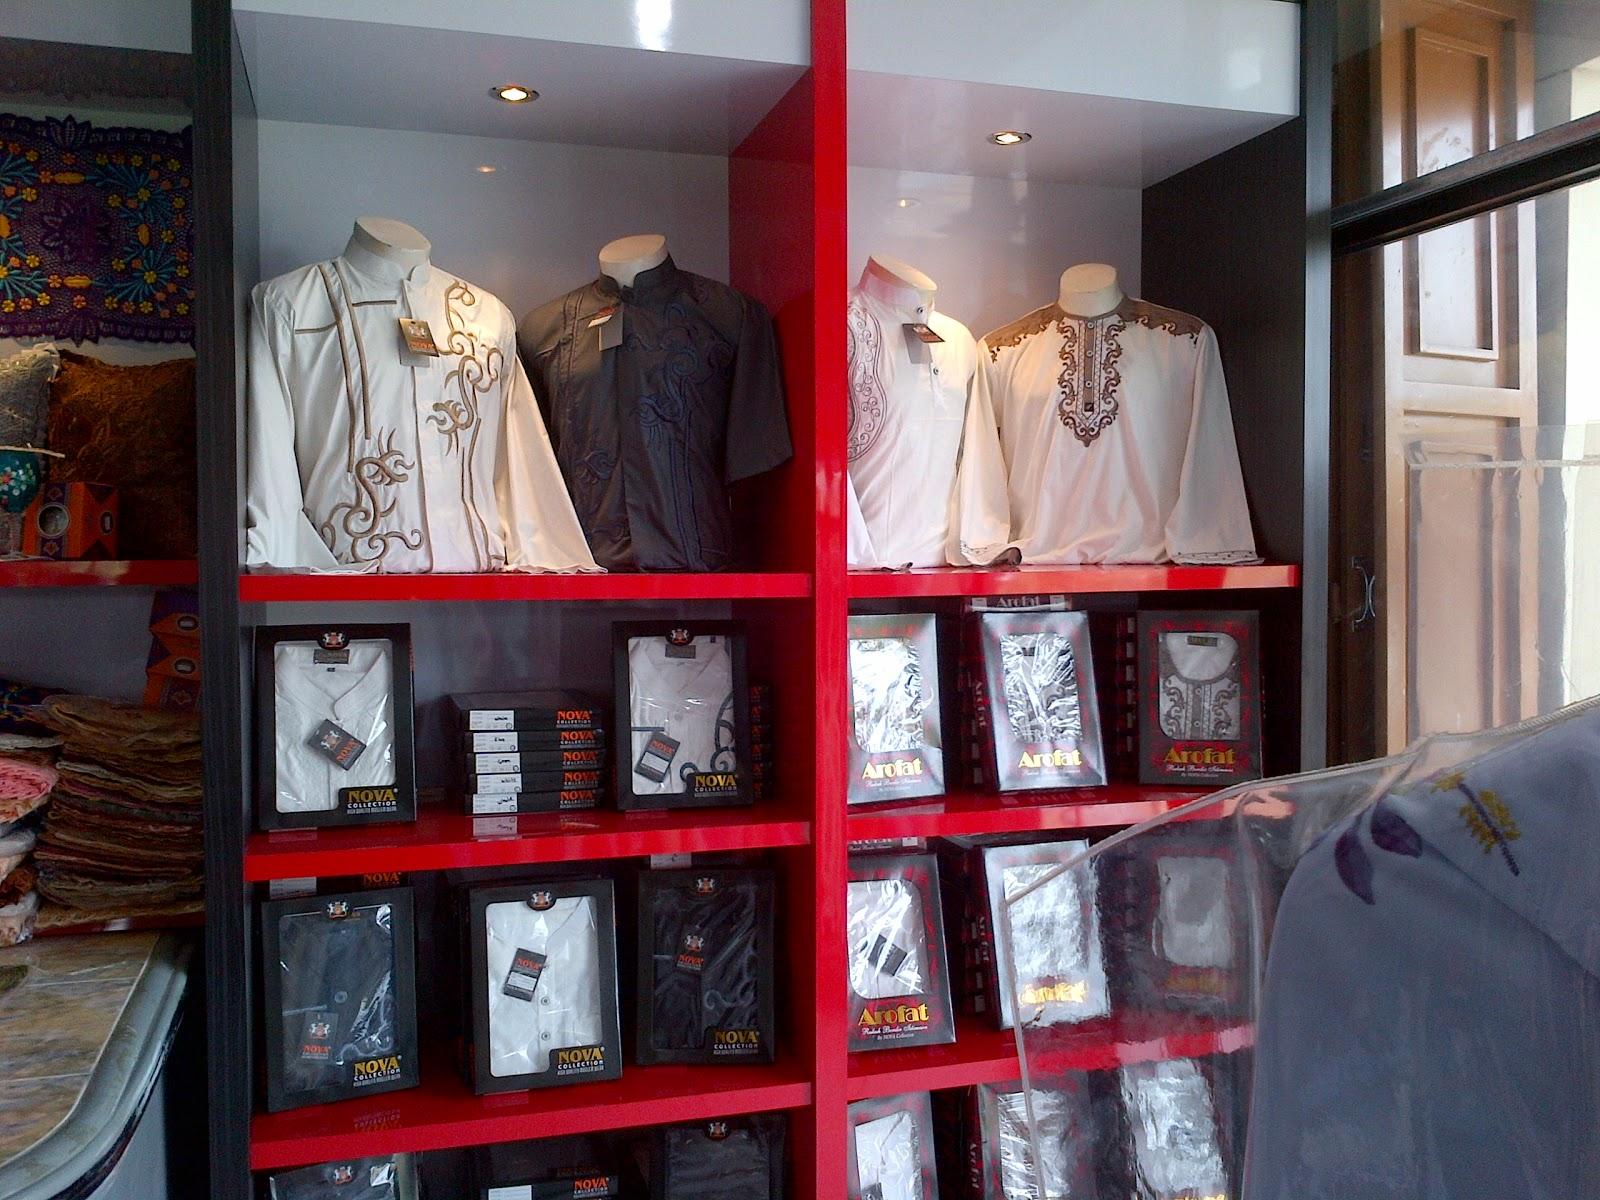 fe1c65f609 Koleksi Produk Busana Nova Collection - Outlet Bodir Tasikmalaya